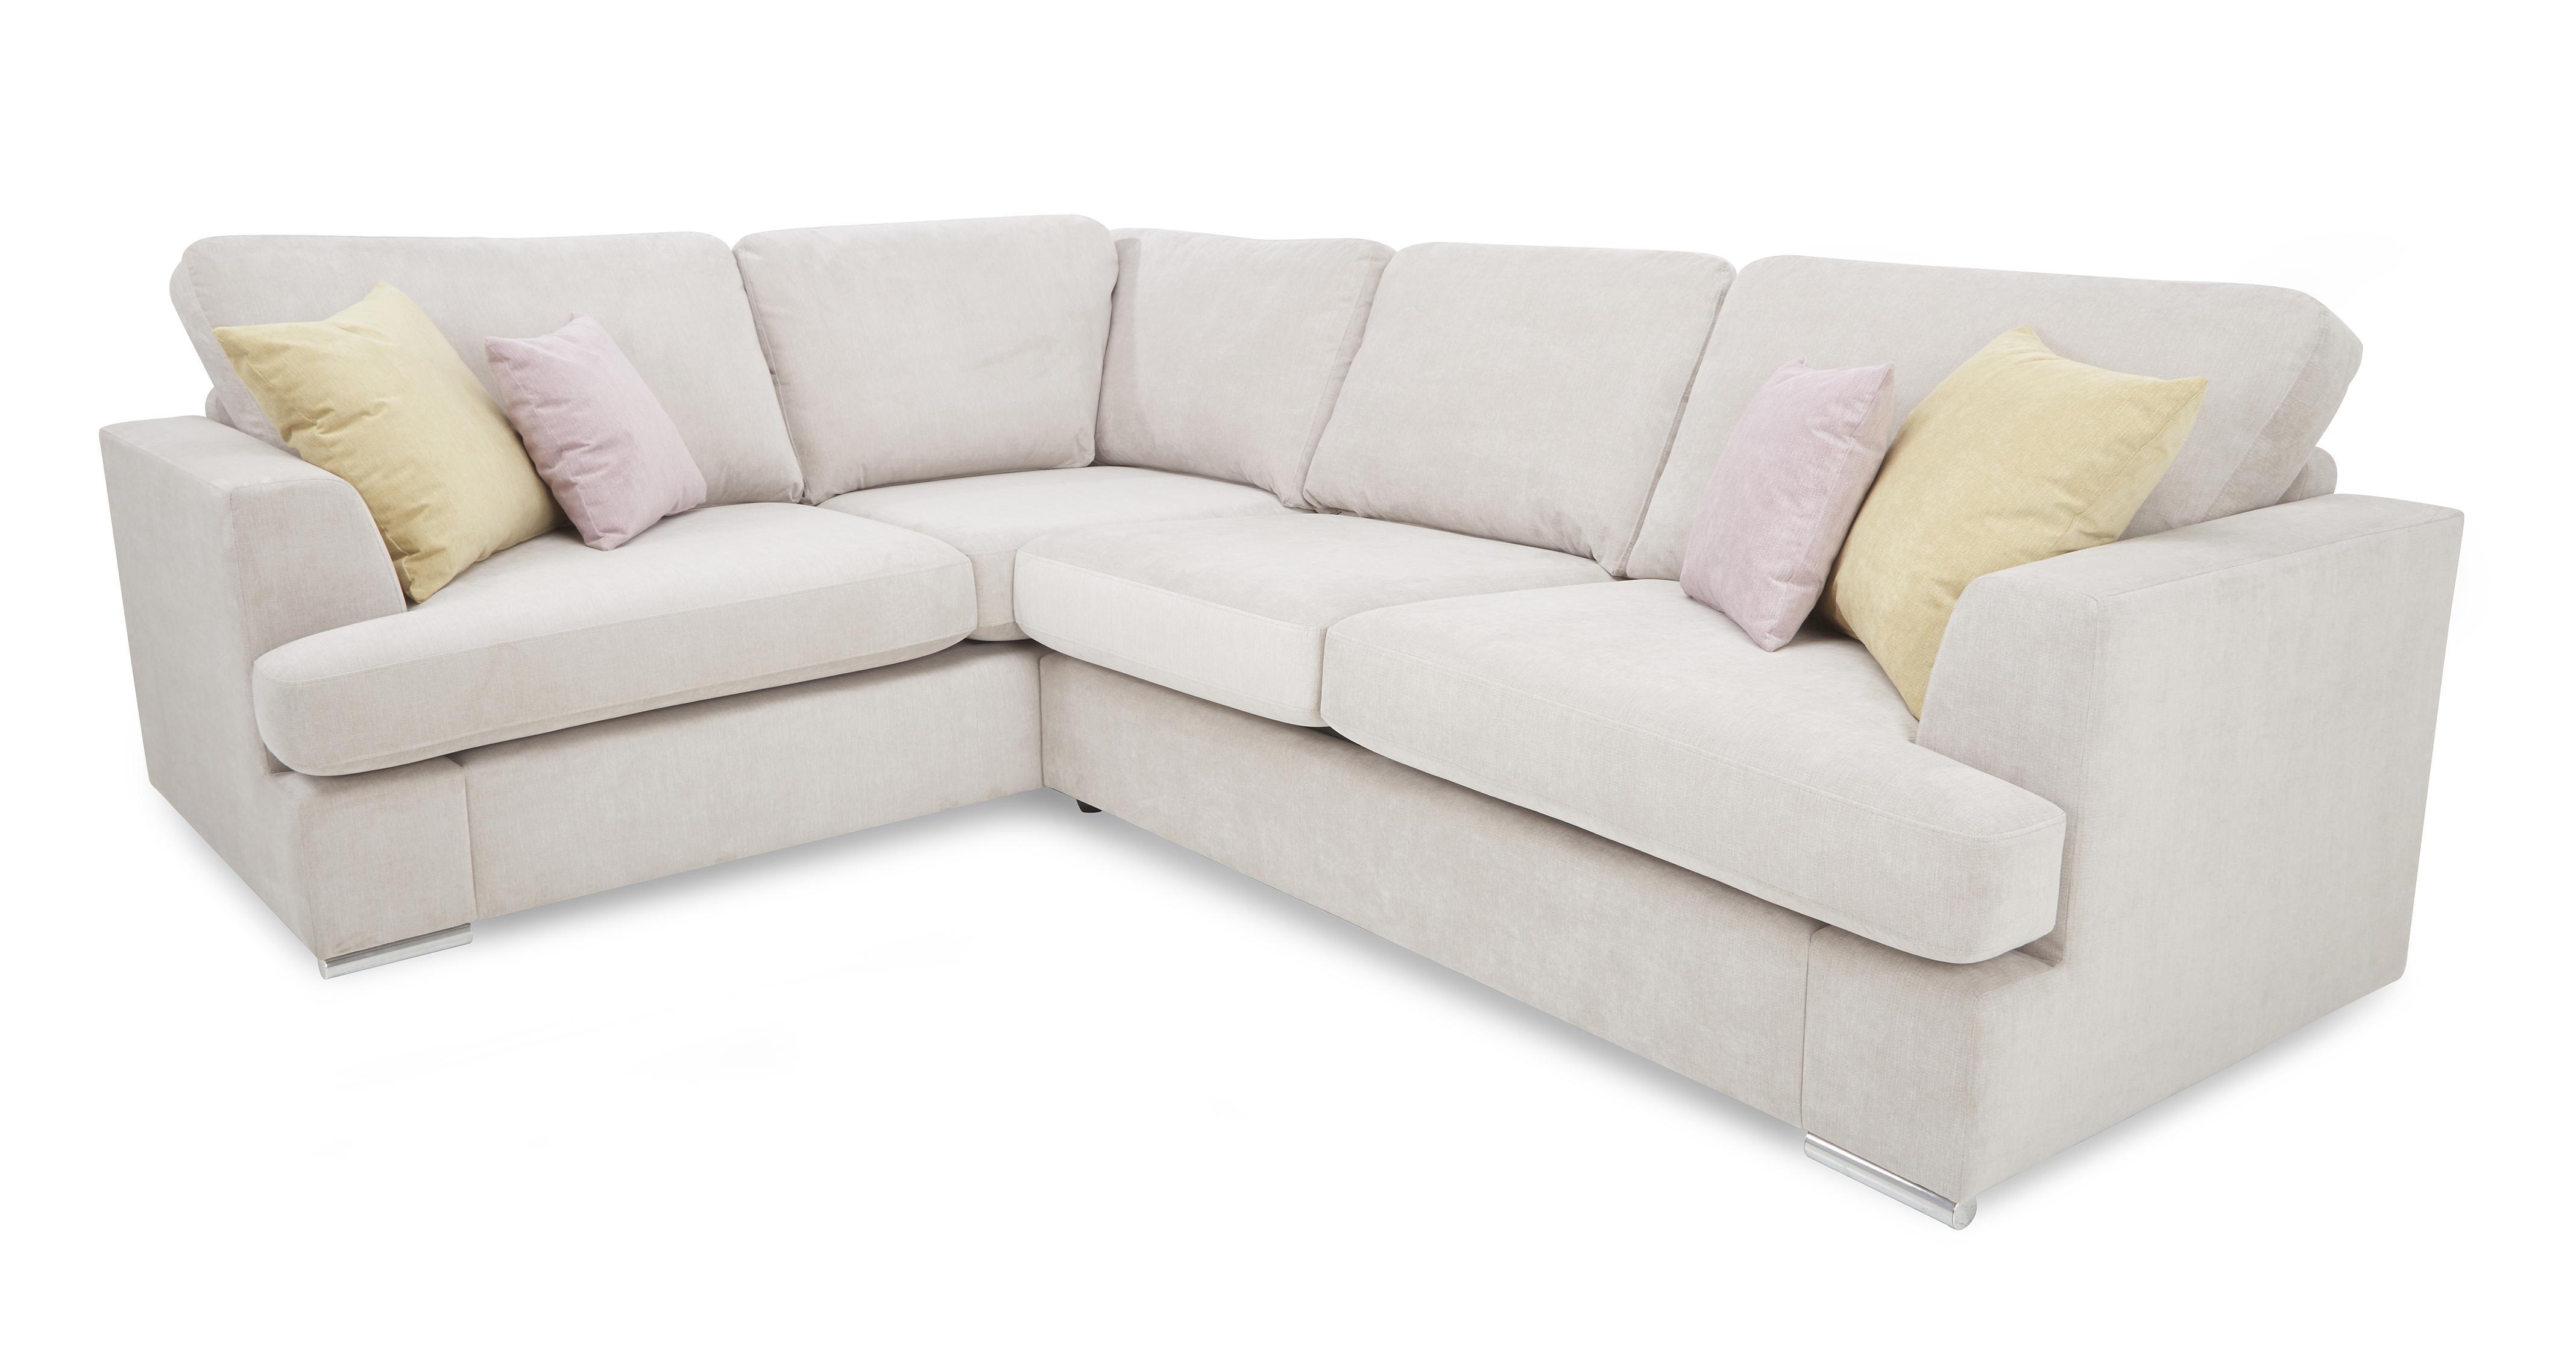 Freya Right Hand Facing 2 Piece Corner Sofa